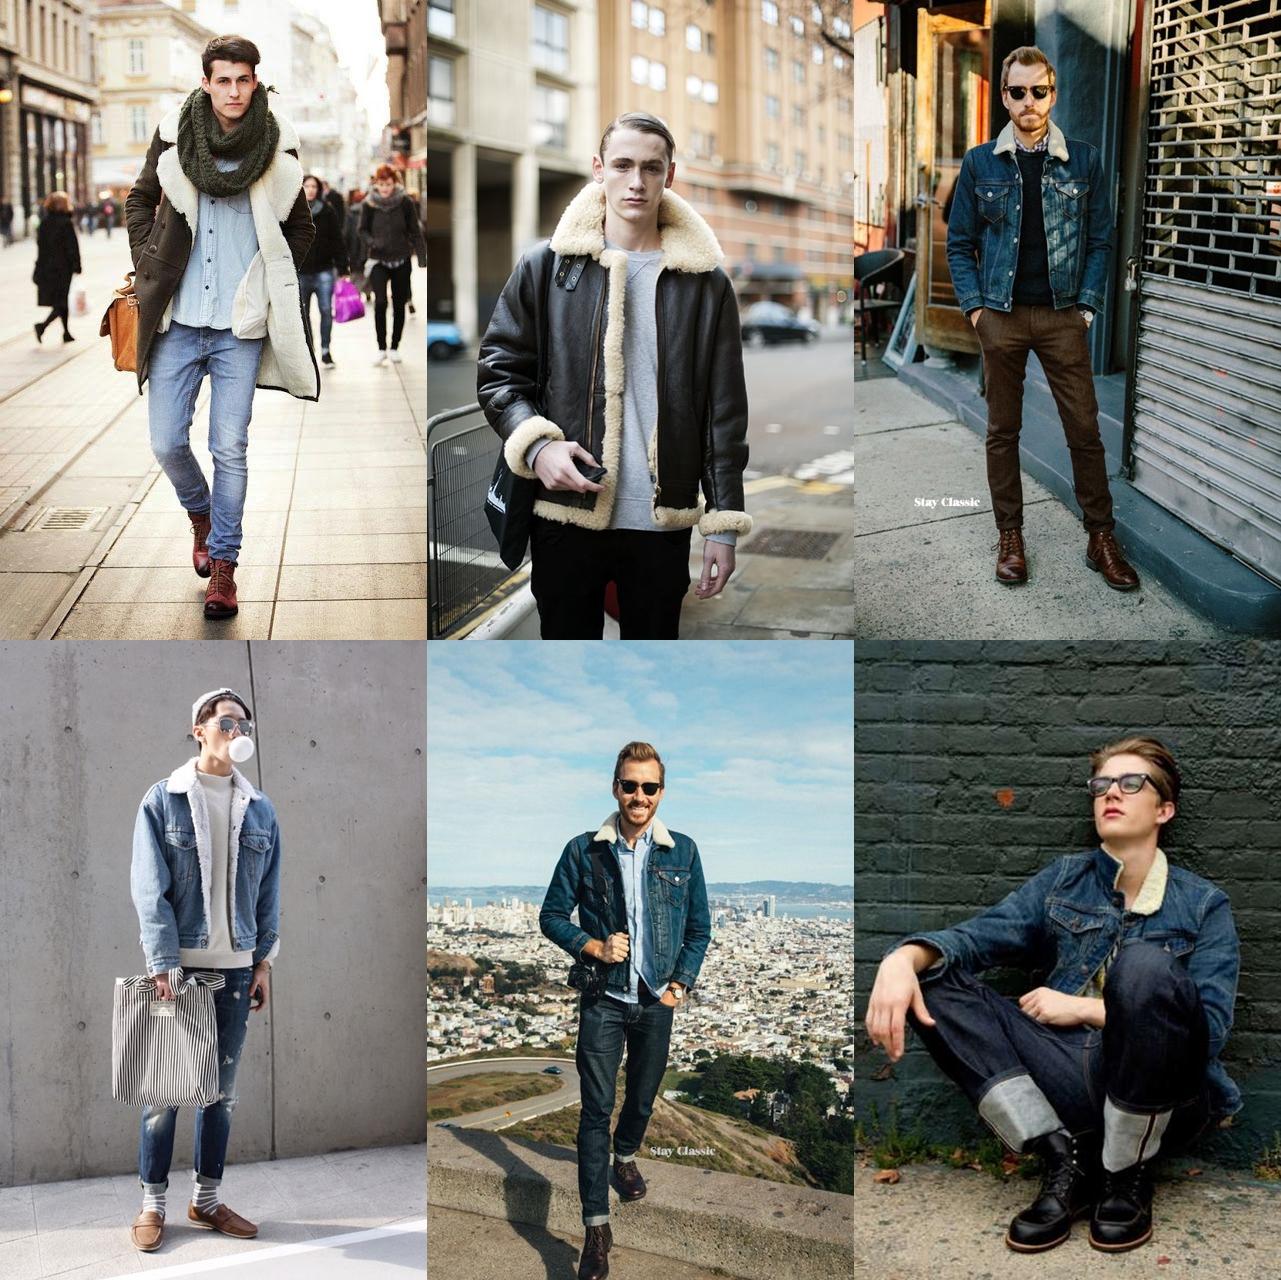 jaqueta pele de carneiro, jaqueta masculina, Sherpa Trucker Jacket. moda masculina, menswear, blogger, blog de moda, alex cursino, moda sem censura, dicas de moda, 4